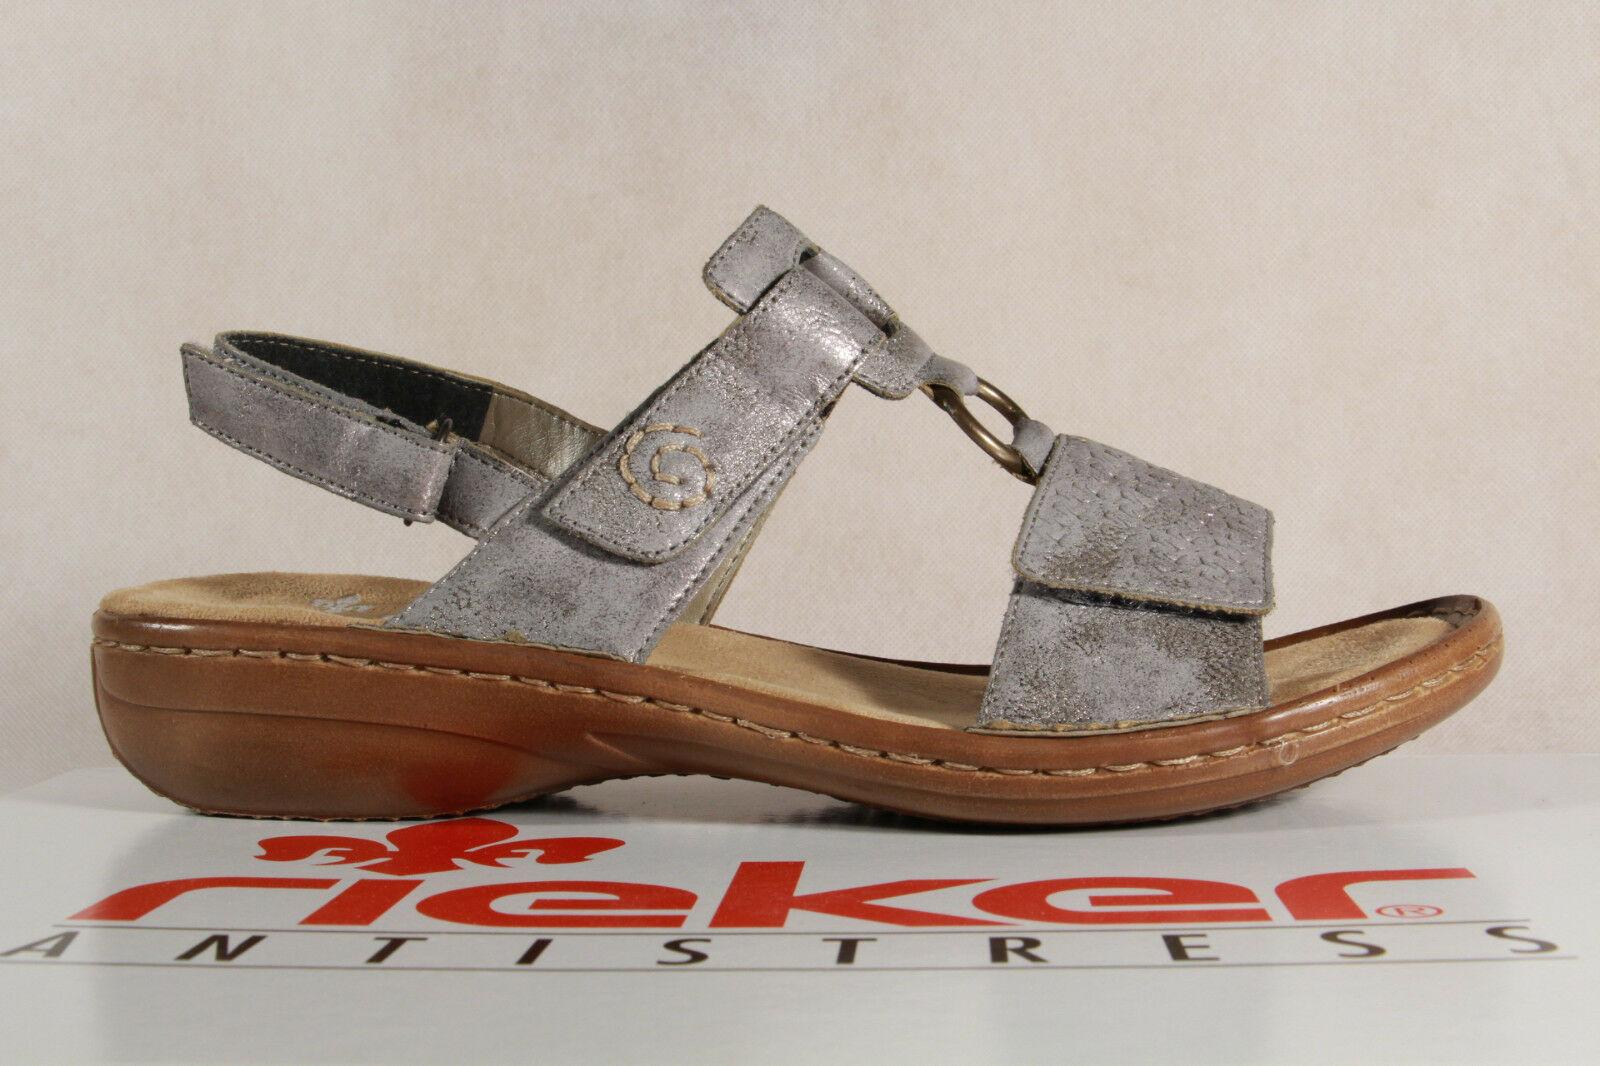 Rieker Damen Sandale Sandalen Sandalette Sandaletten grau Koxxx